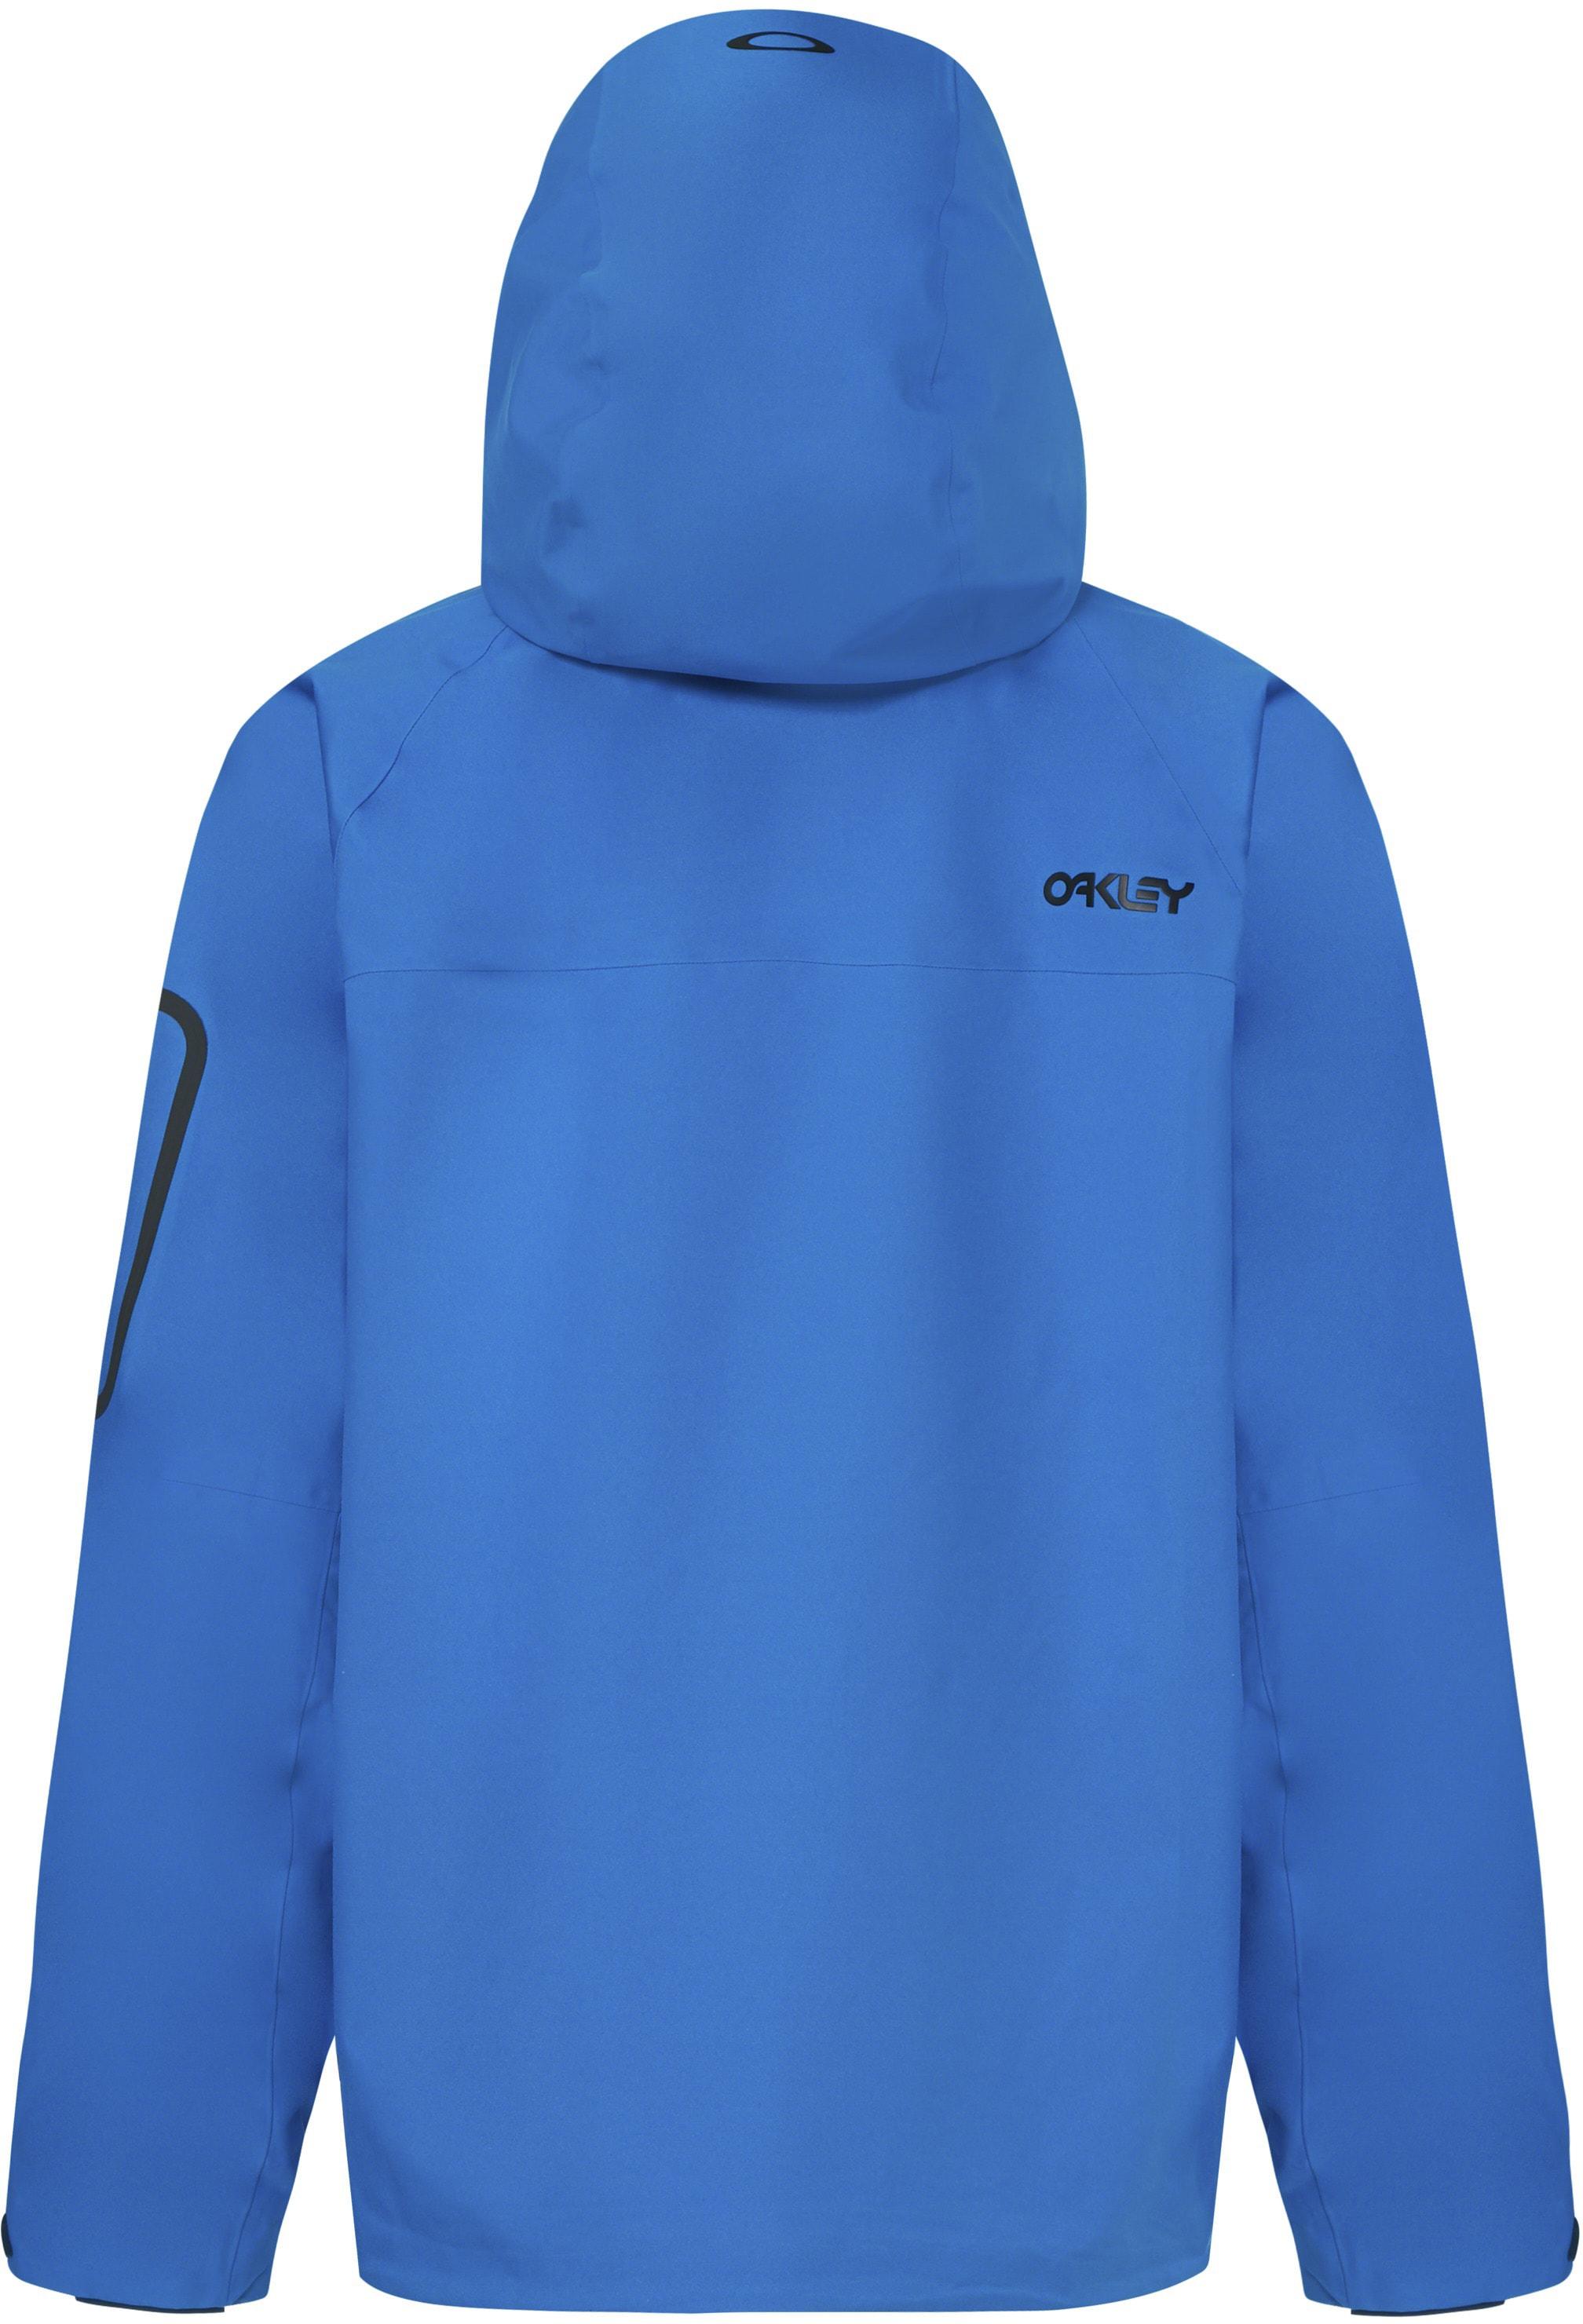 b5af52e1e0e Oakley Snow Shell 10K 2L Anorak Snowboard Jacket - thumbnail 2